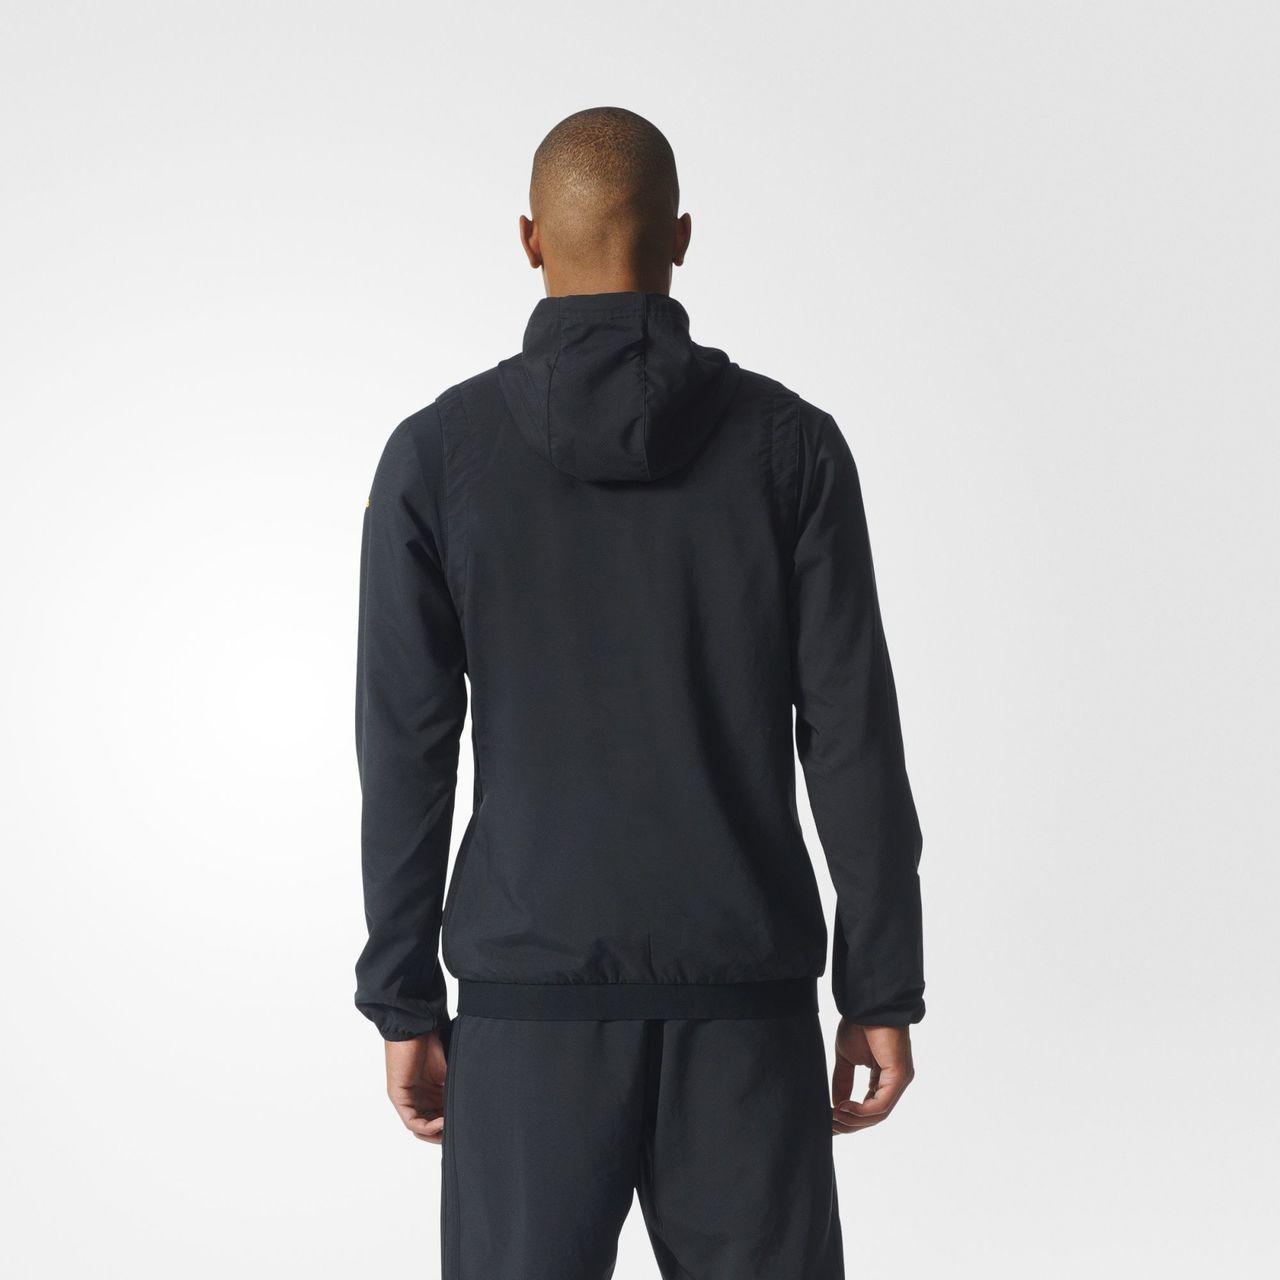 09a0c6fb2ee ... Click to enlarge image  adidas juventus ucl presentation jacket black e.jpg ...